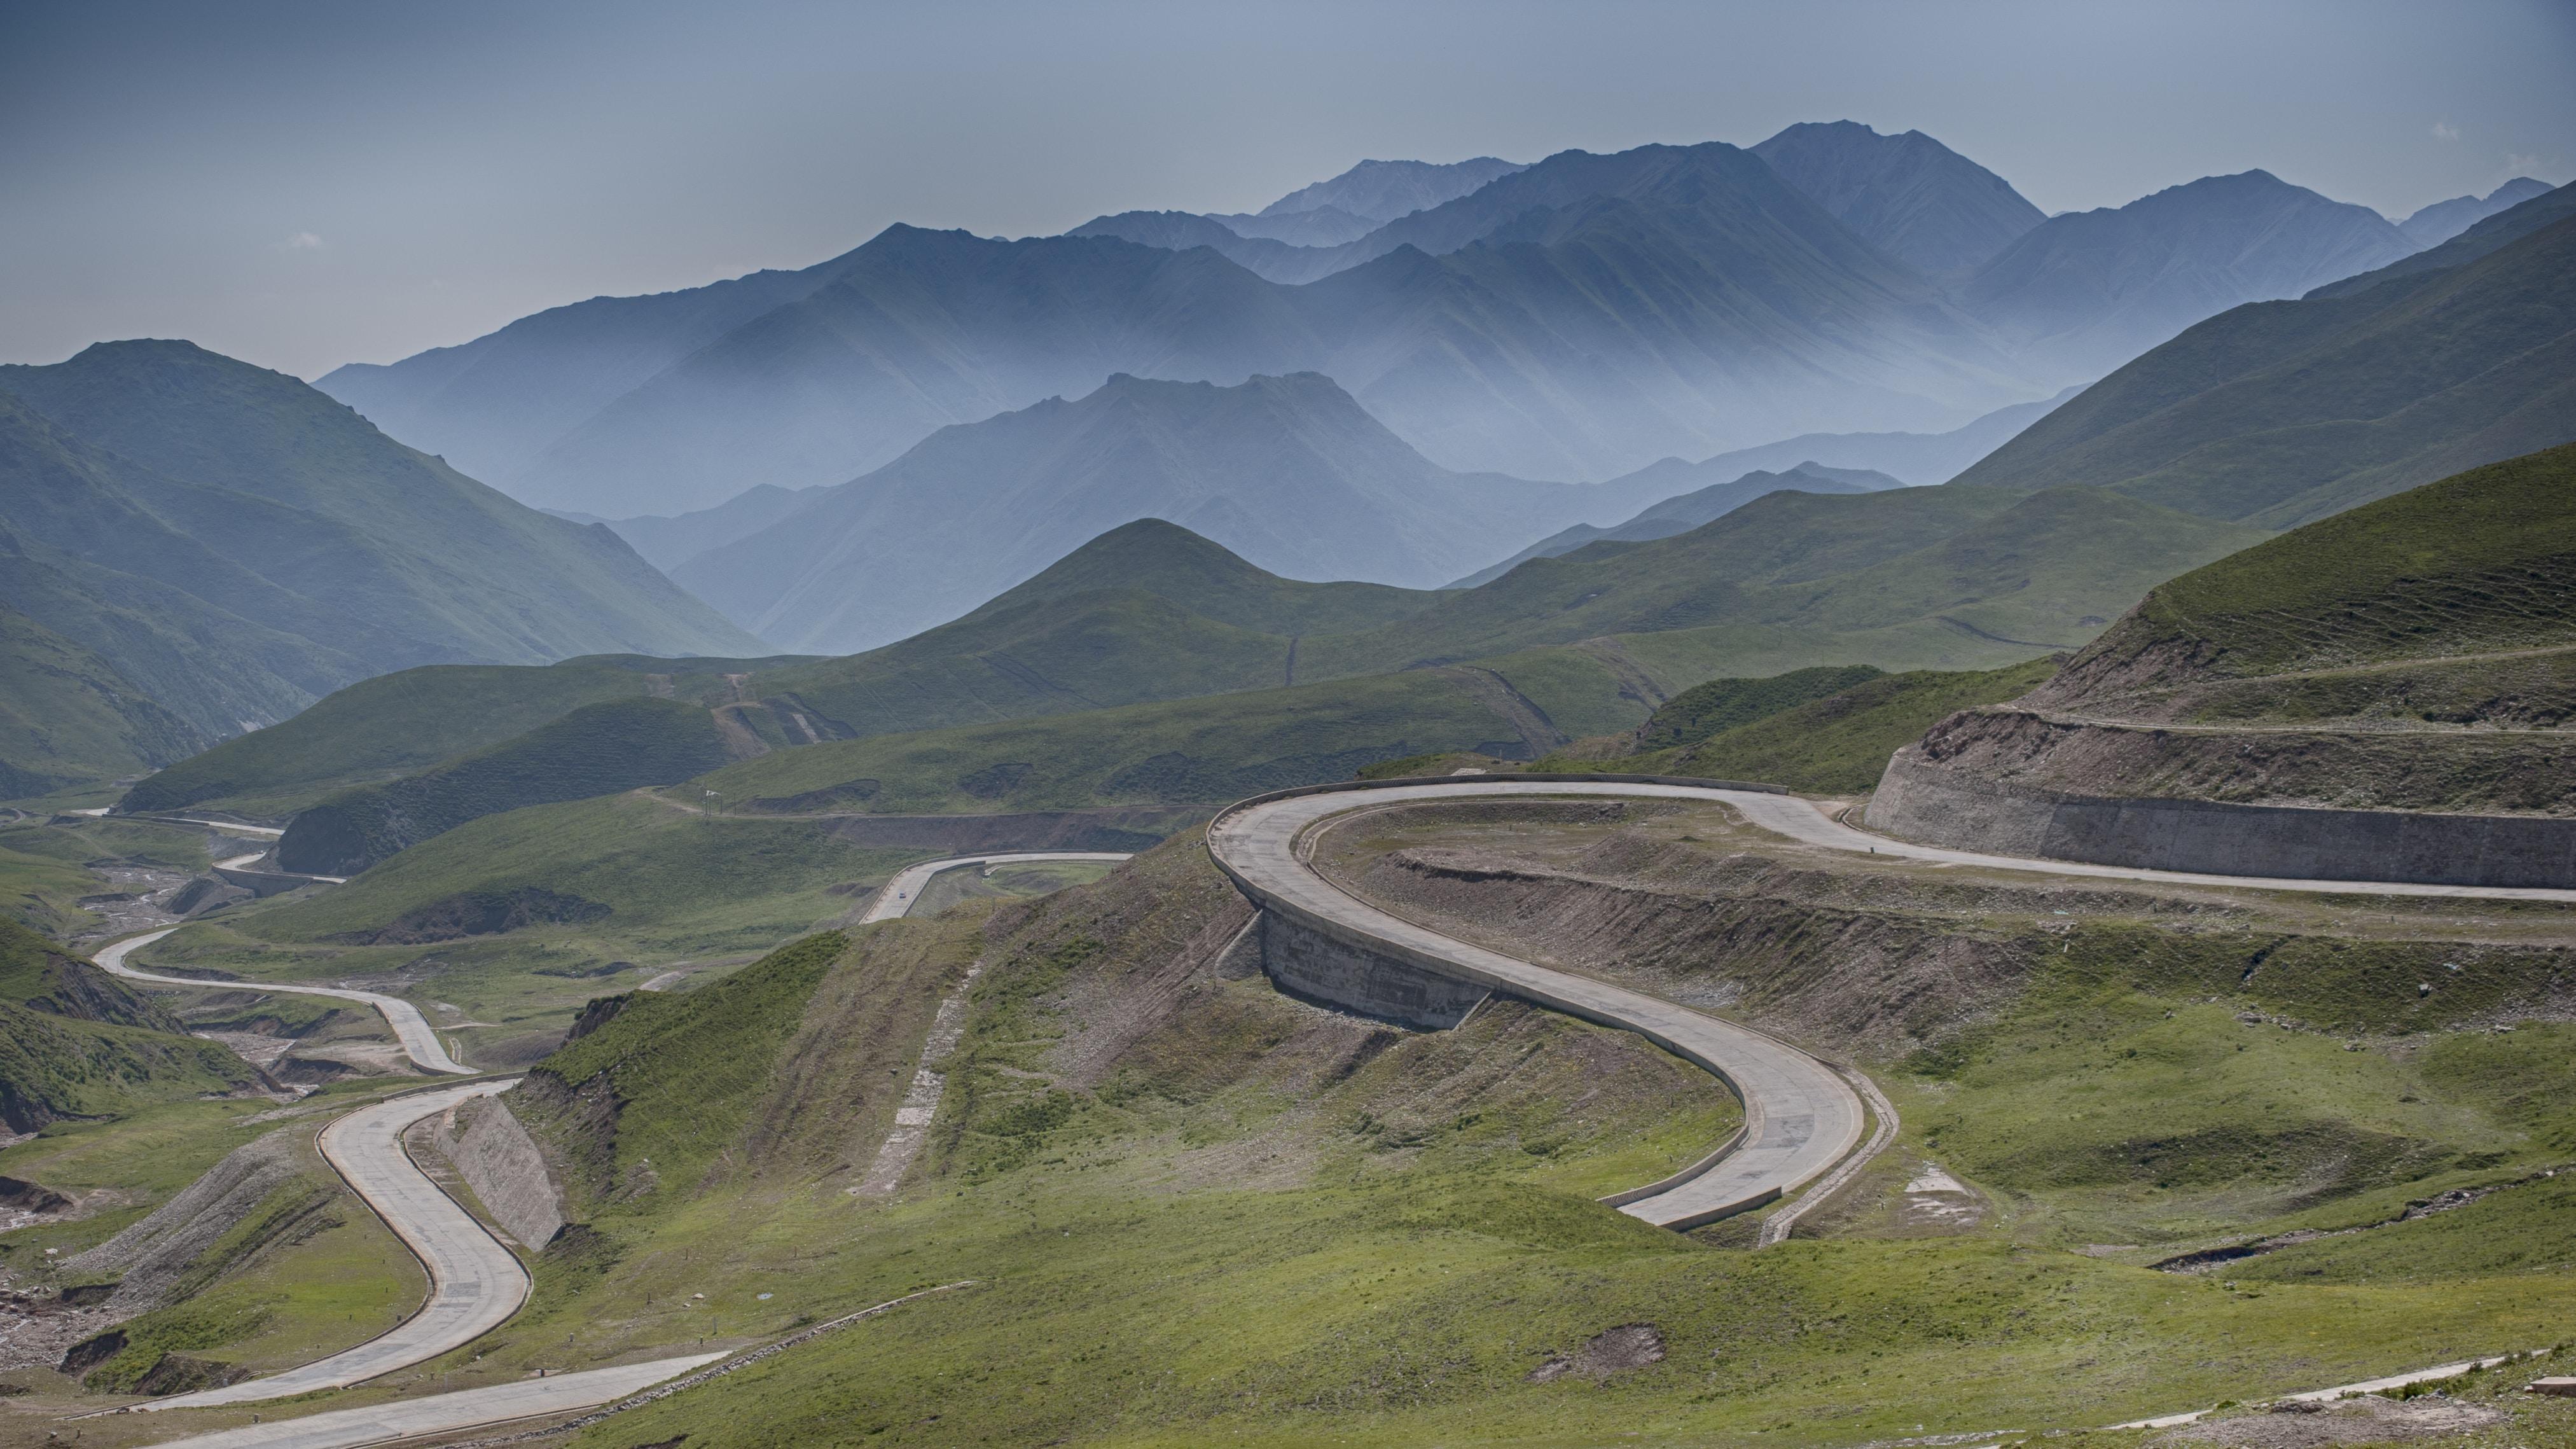 A winding road cutting through green undulating hills